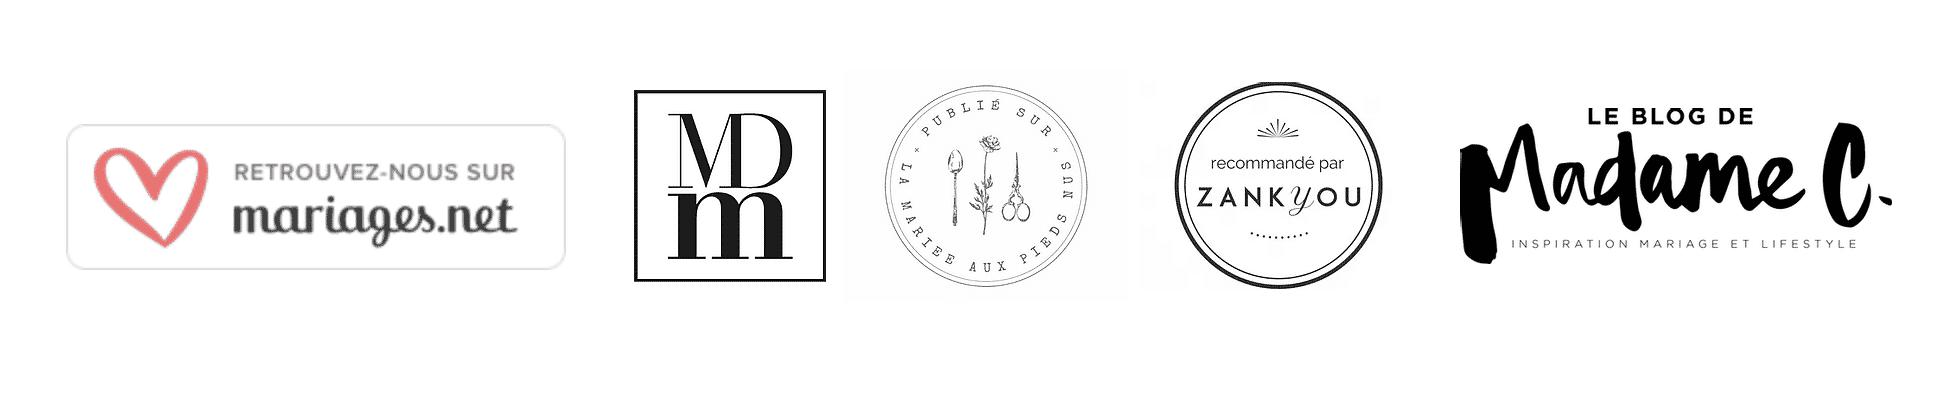 sugar lemon logo recommandation